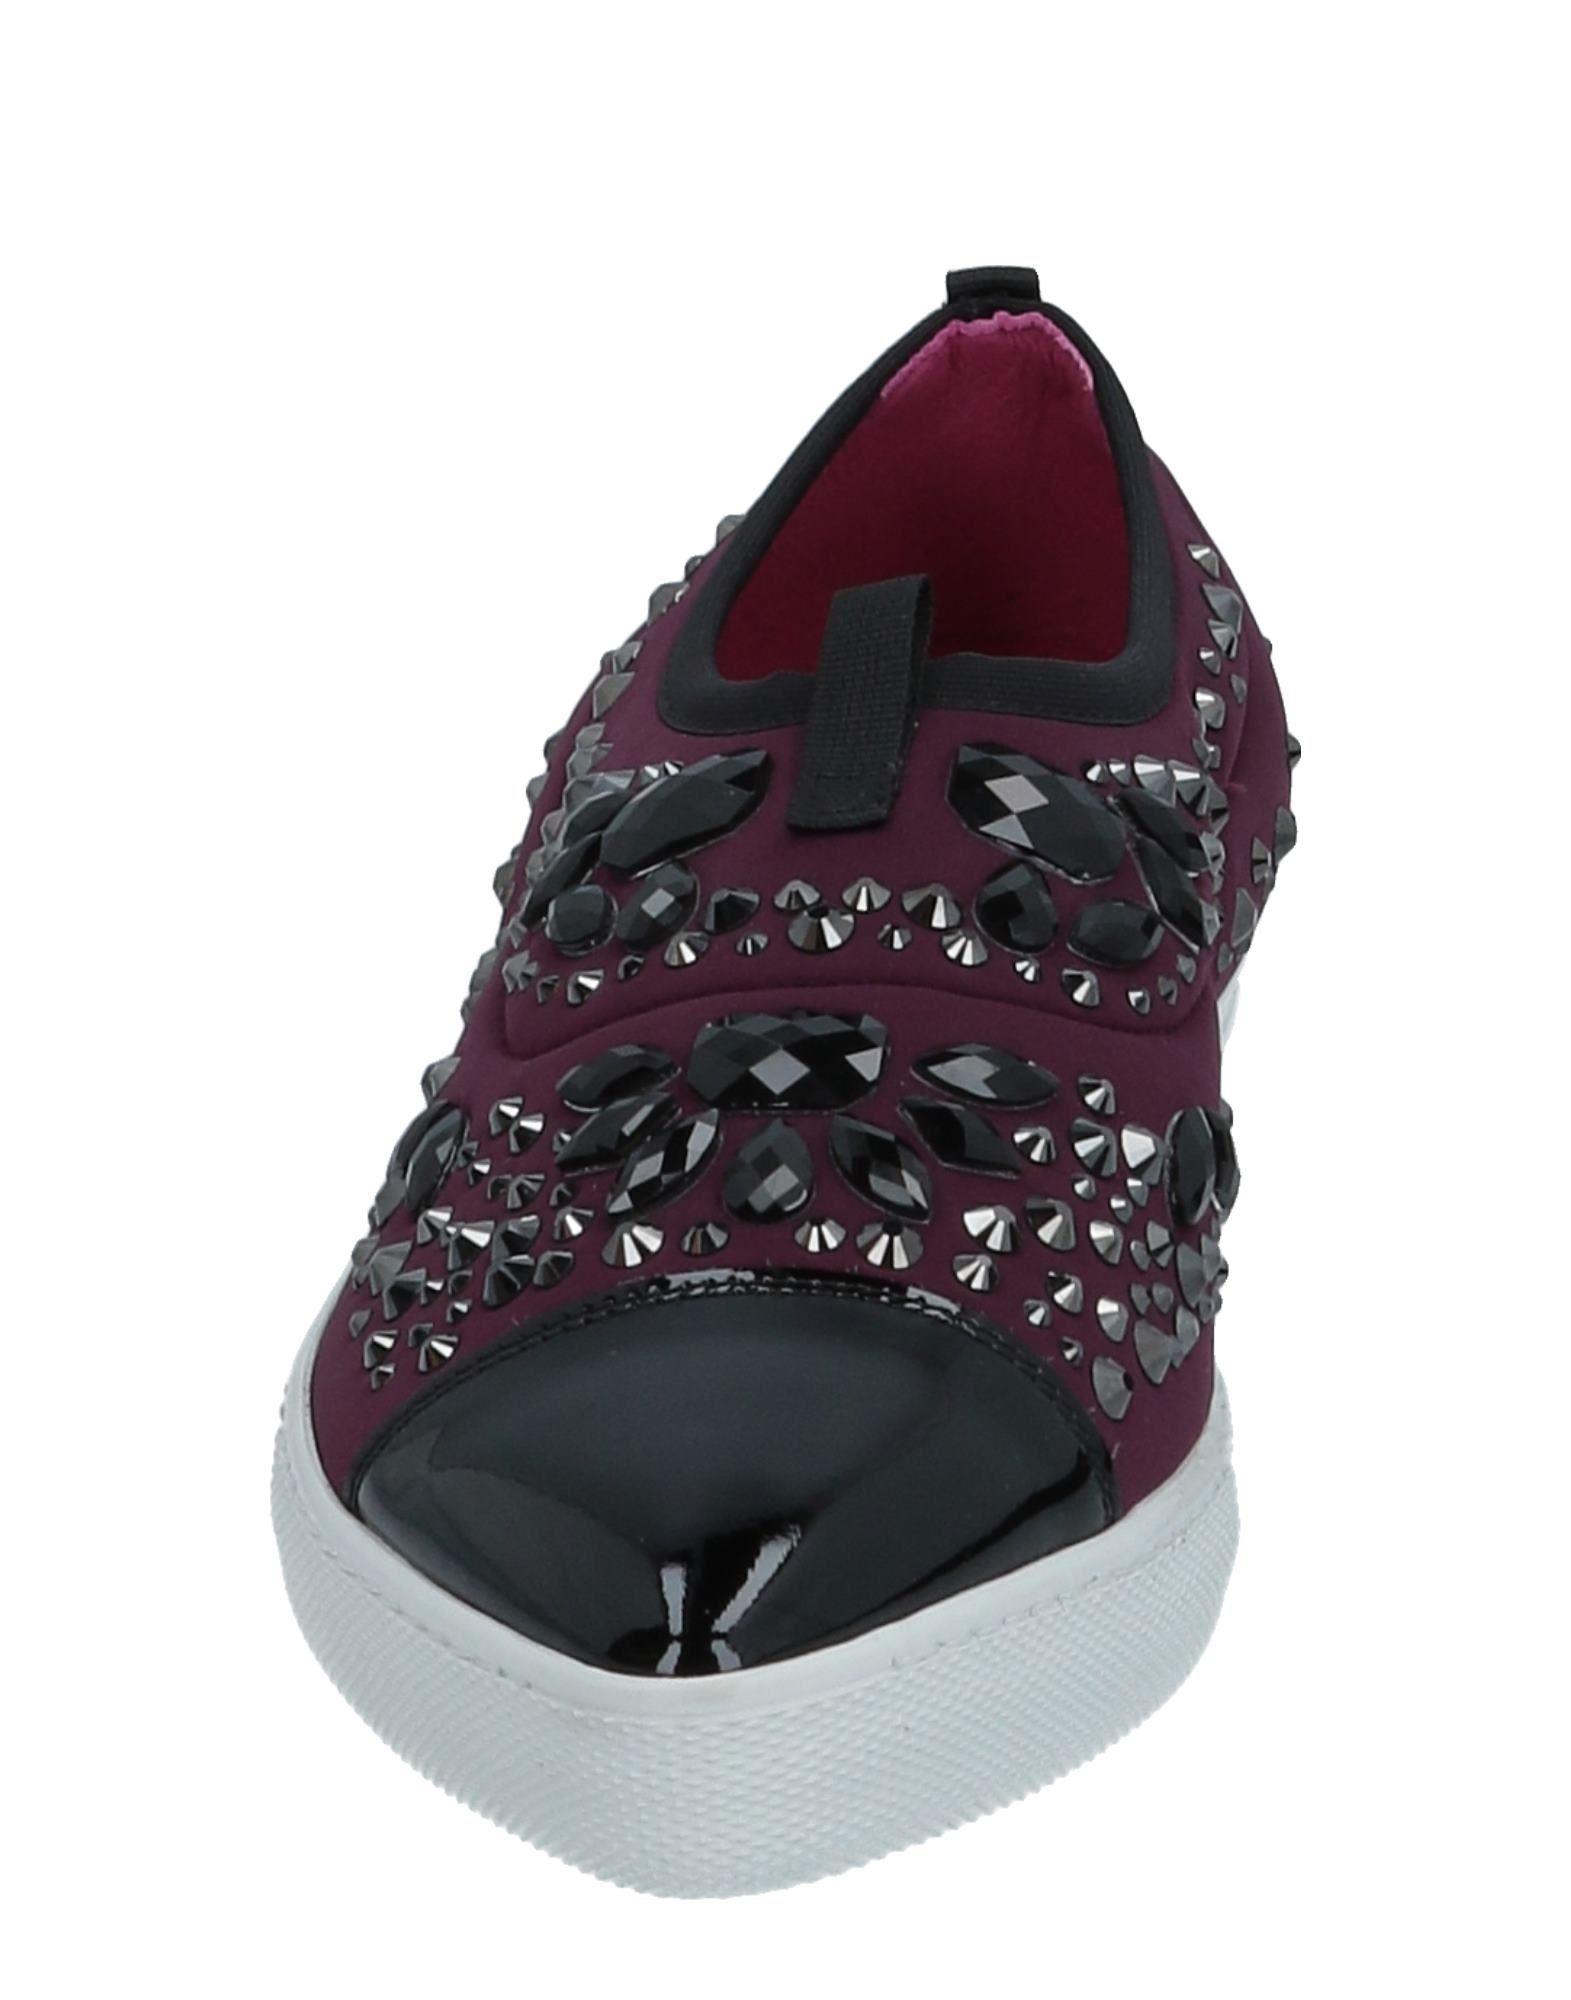 Gut um billige Schuhe zu tragenAlberto 11520761QW Guardiani Sneakers Damen  11520761QW tragenAlberto a709d6